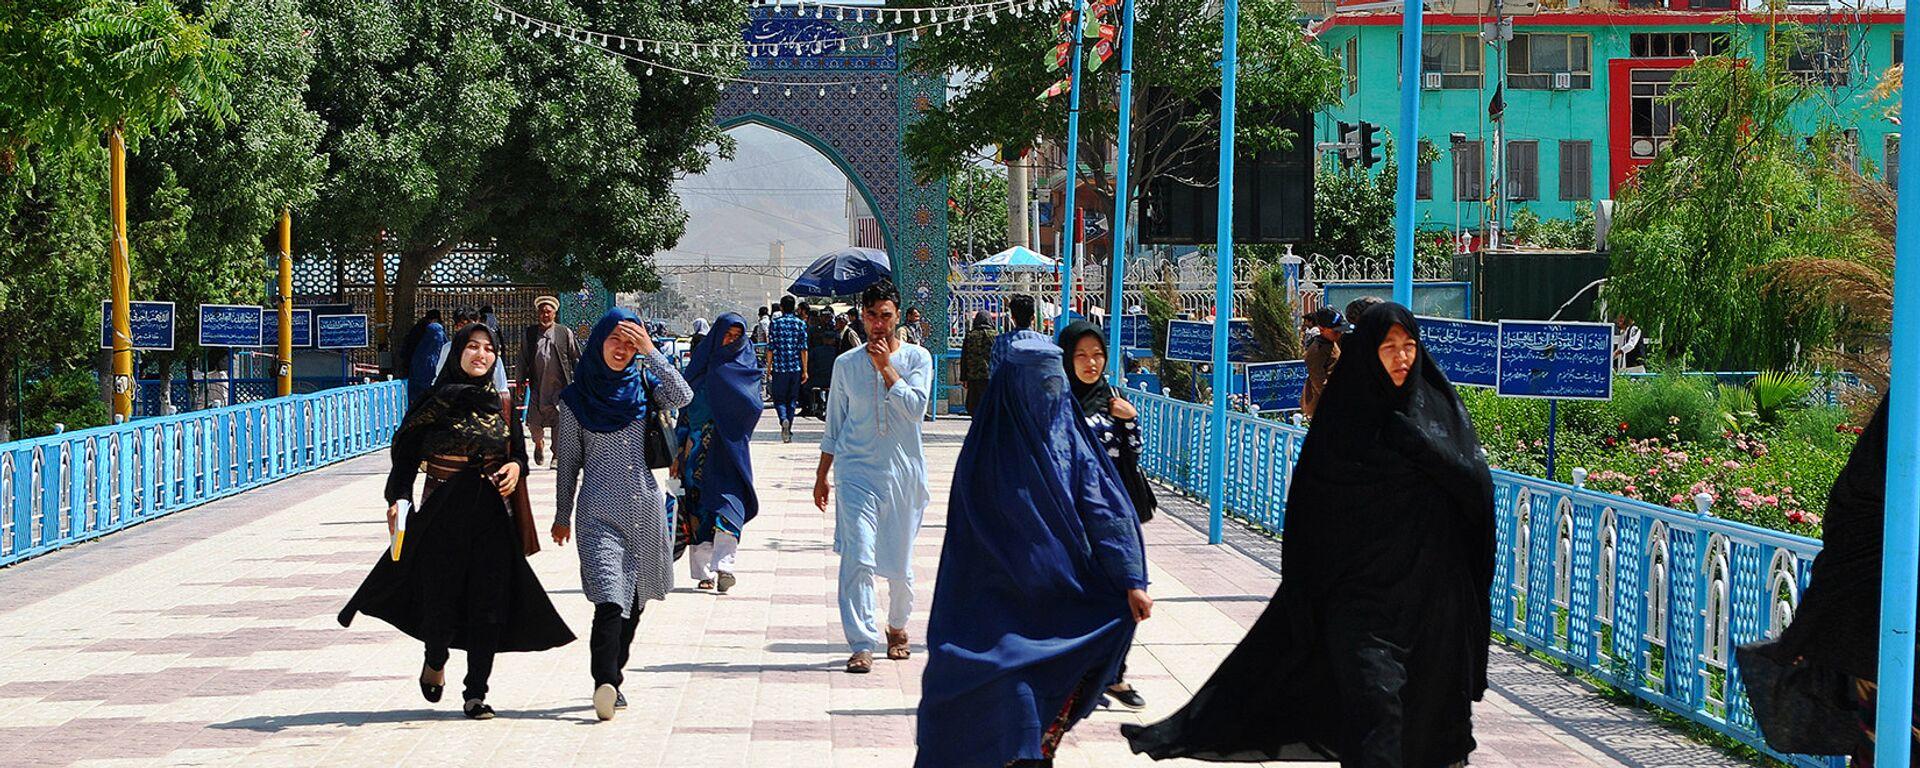 Женщины мусульманки, архивное фото - Sputnik Таджикистан, 1920, 19.08.2021